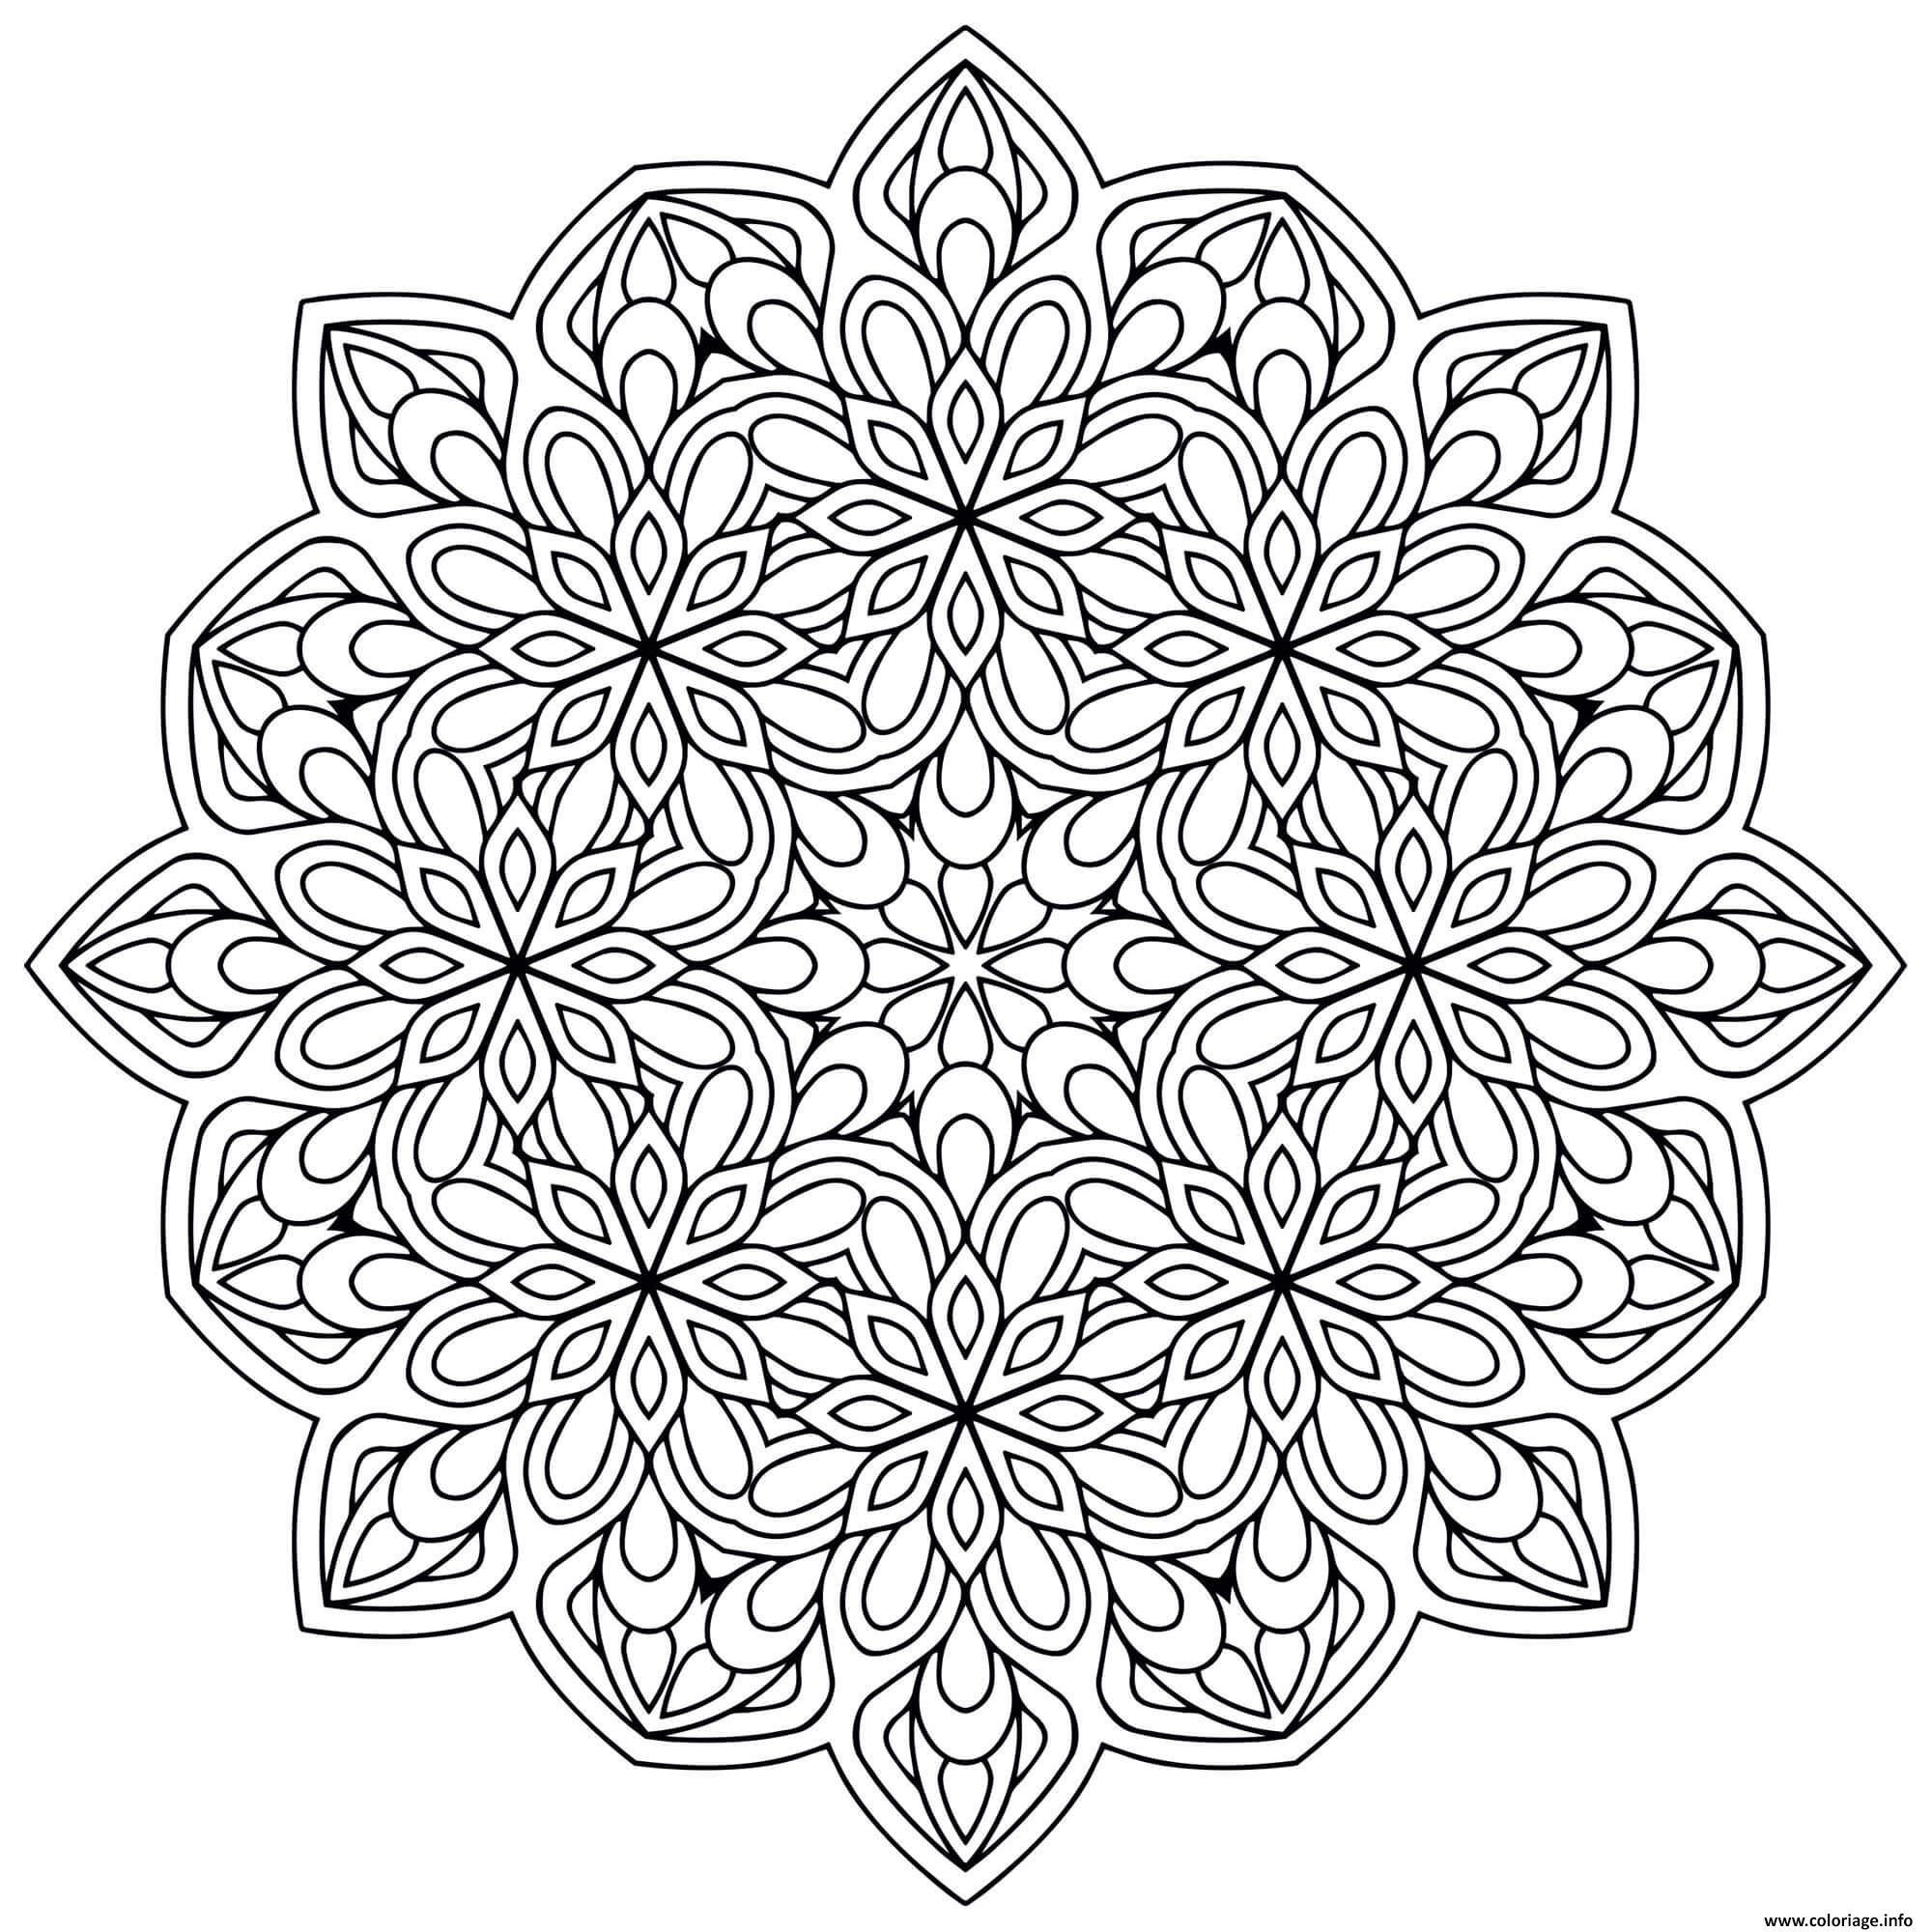 Coloriage Mandala Zen Antistress Fleurs dessin